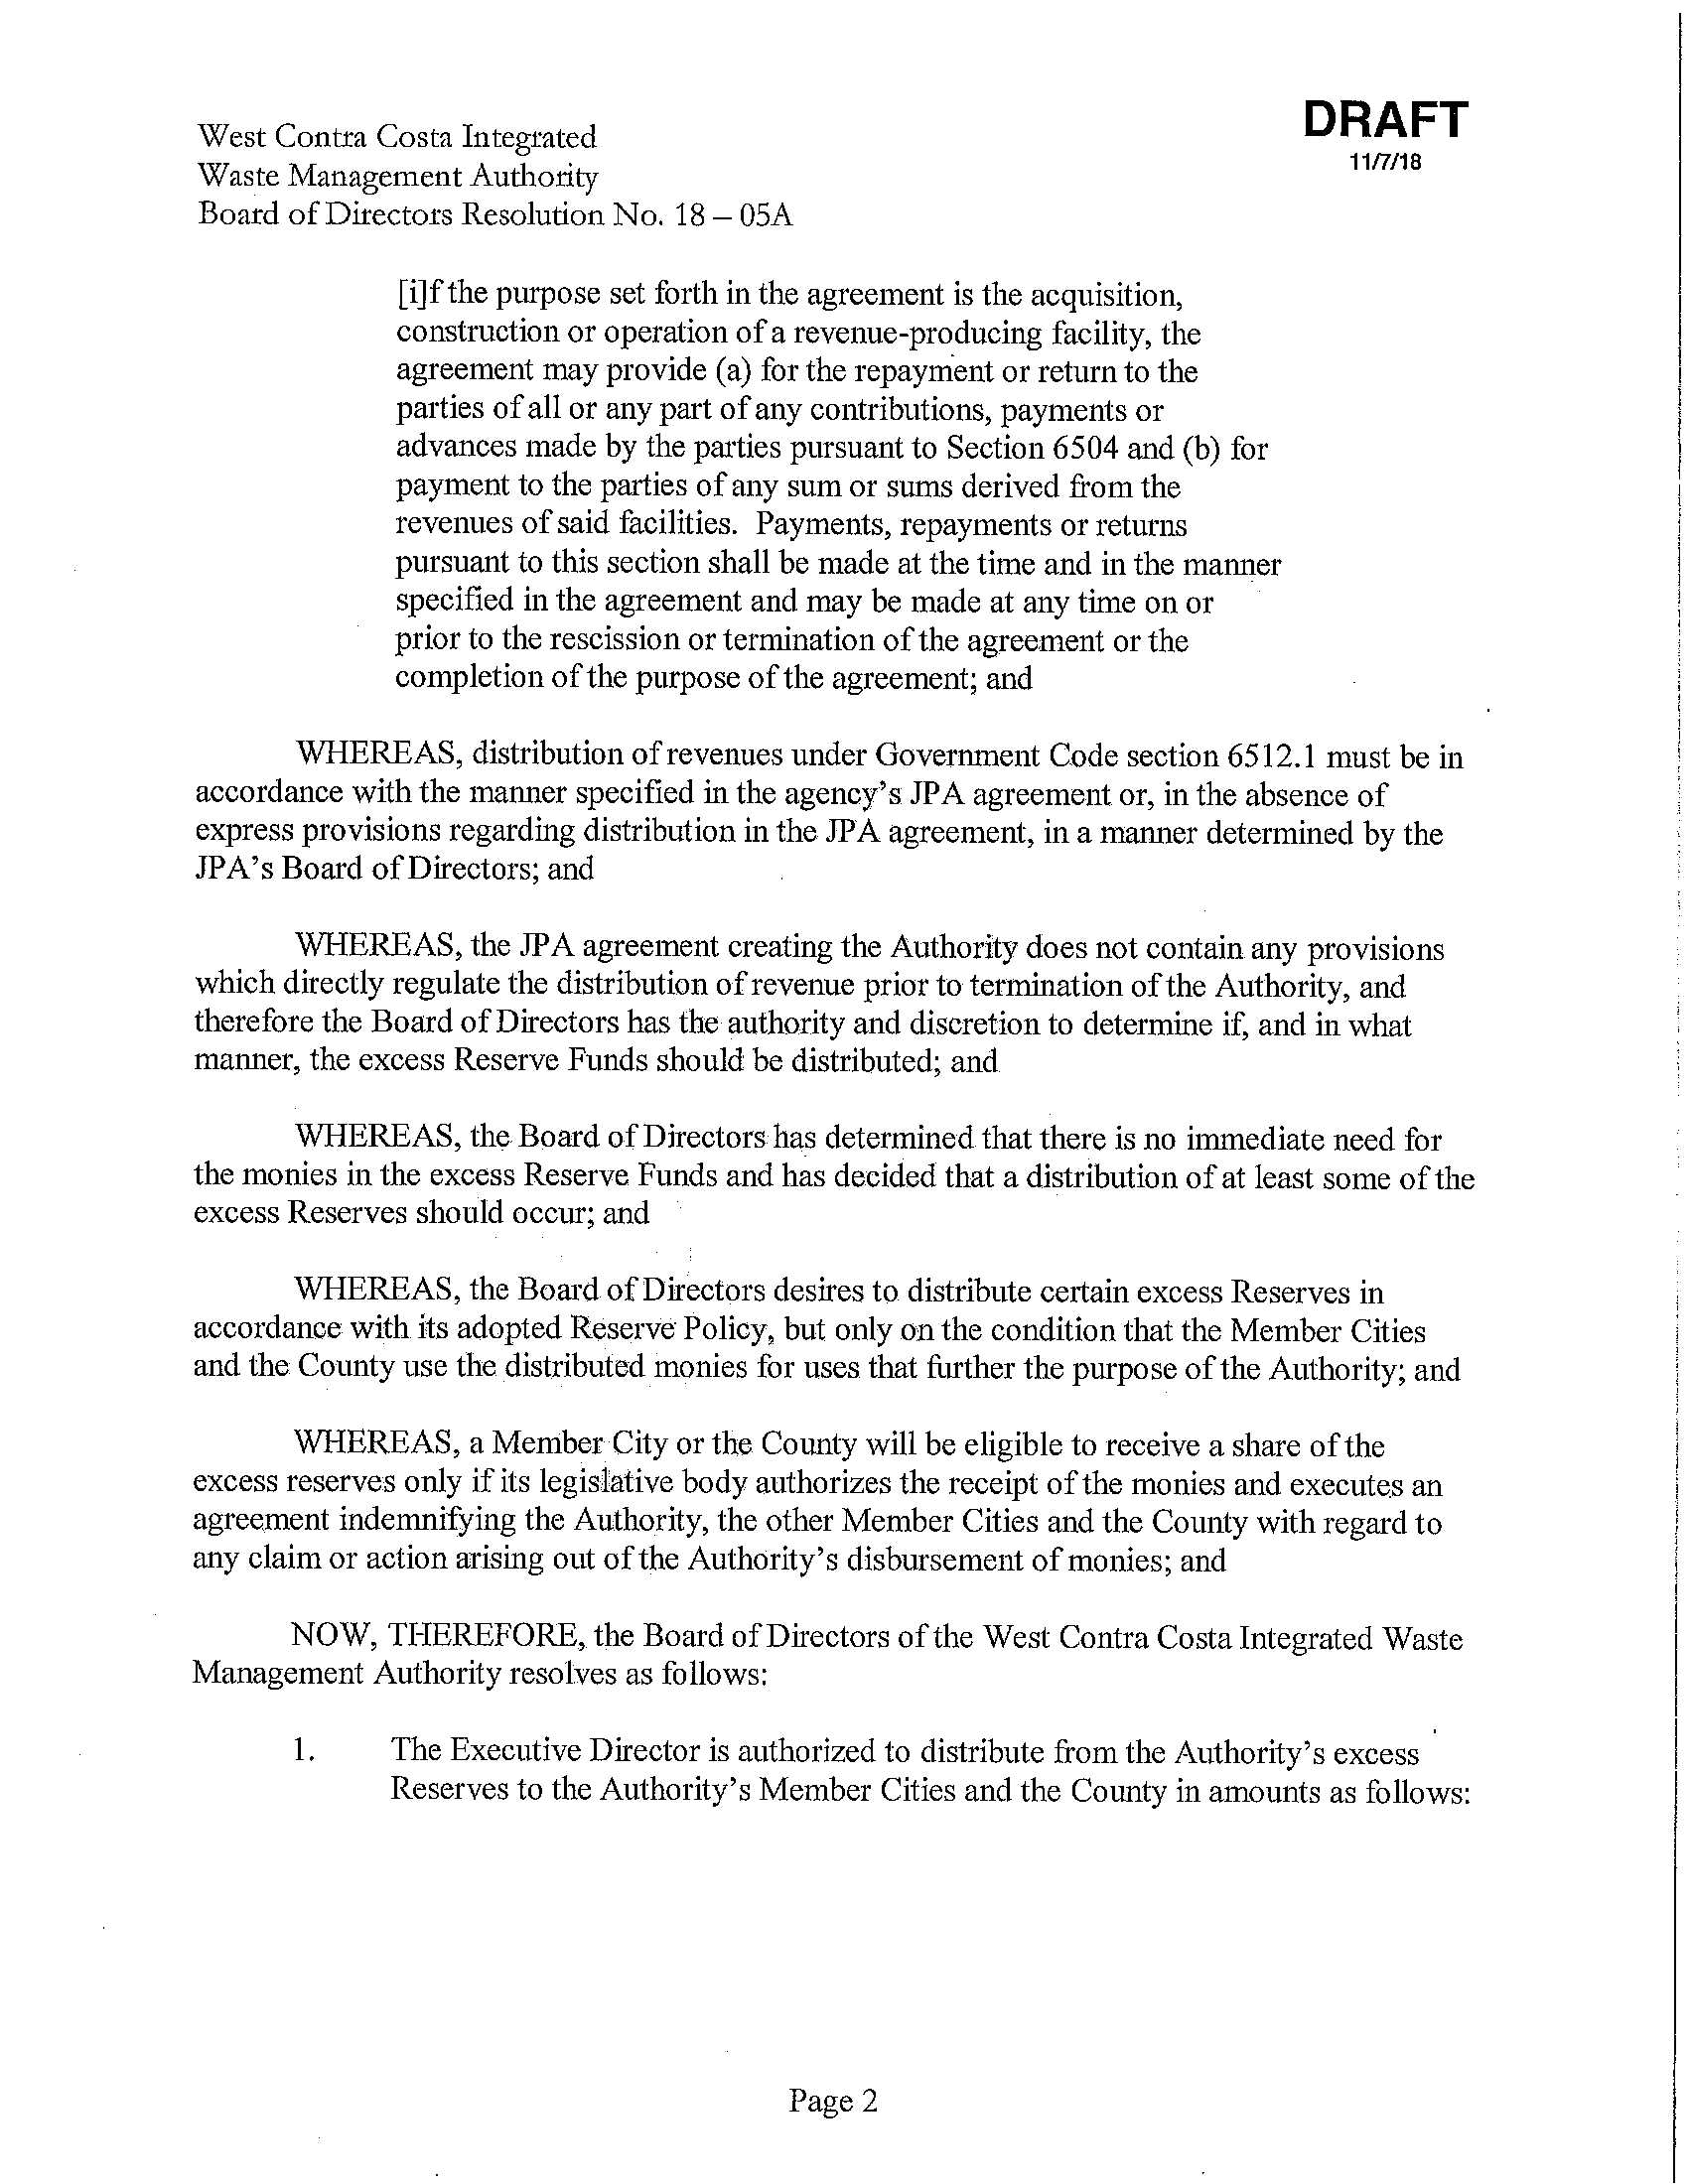 ESMAC Agenda 11.14.2018 (46 Pages)_20.jpg